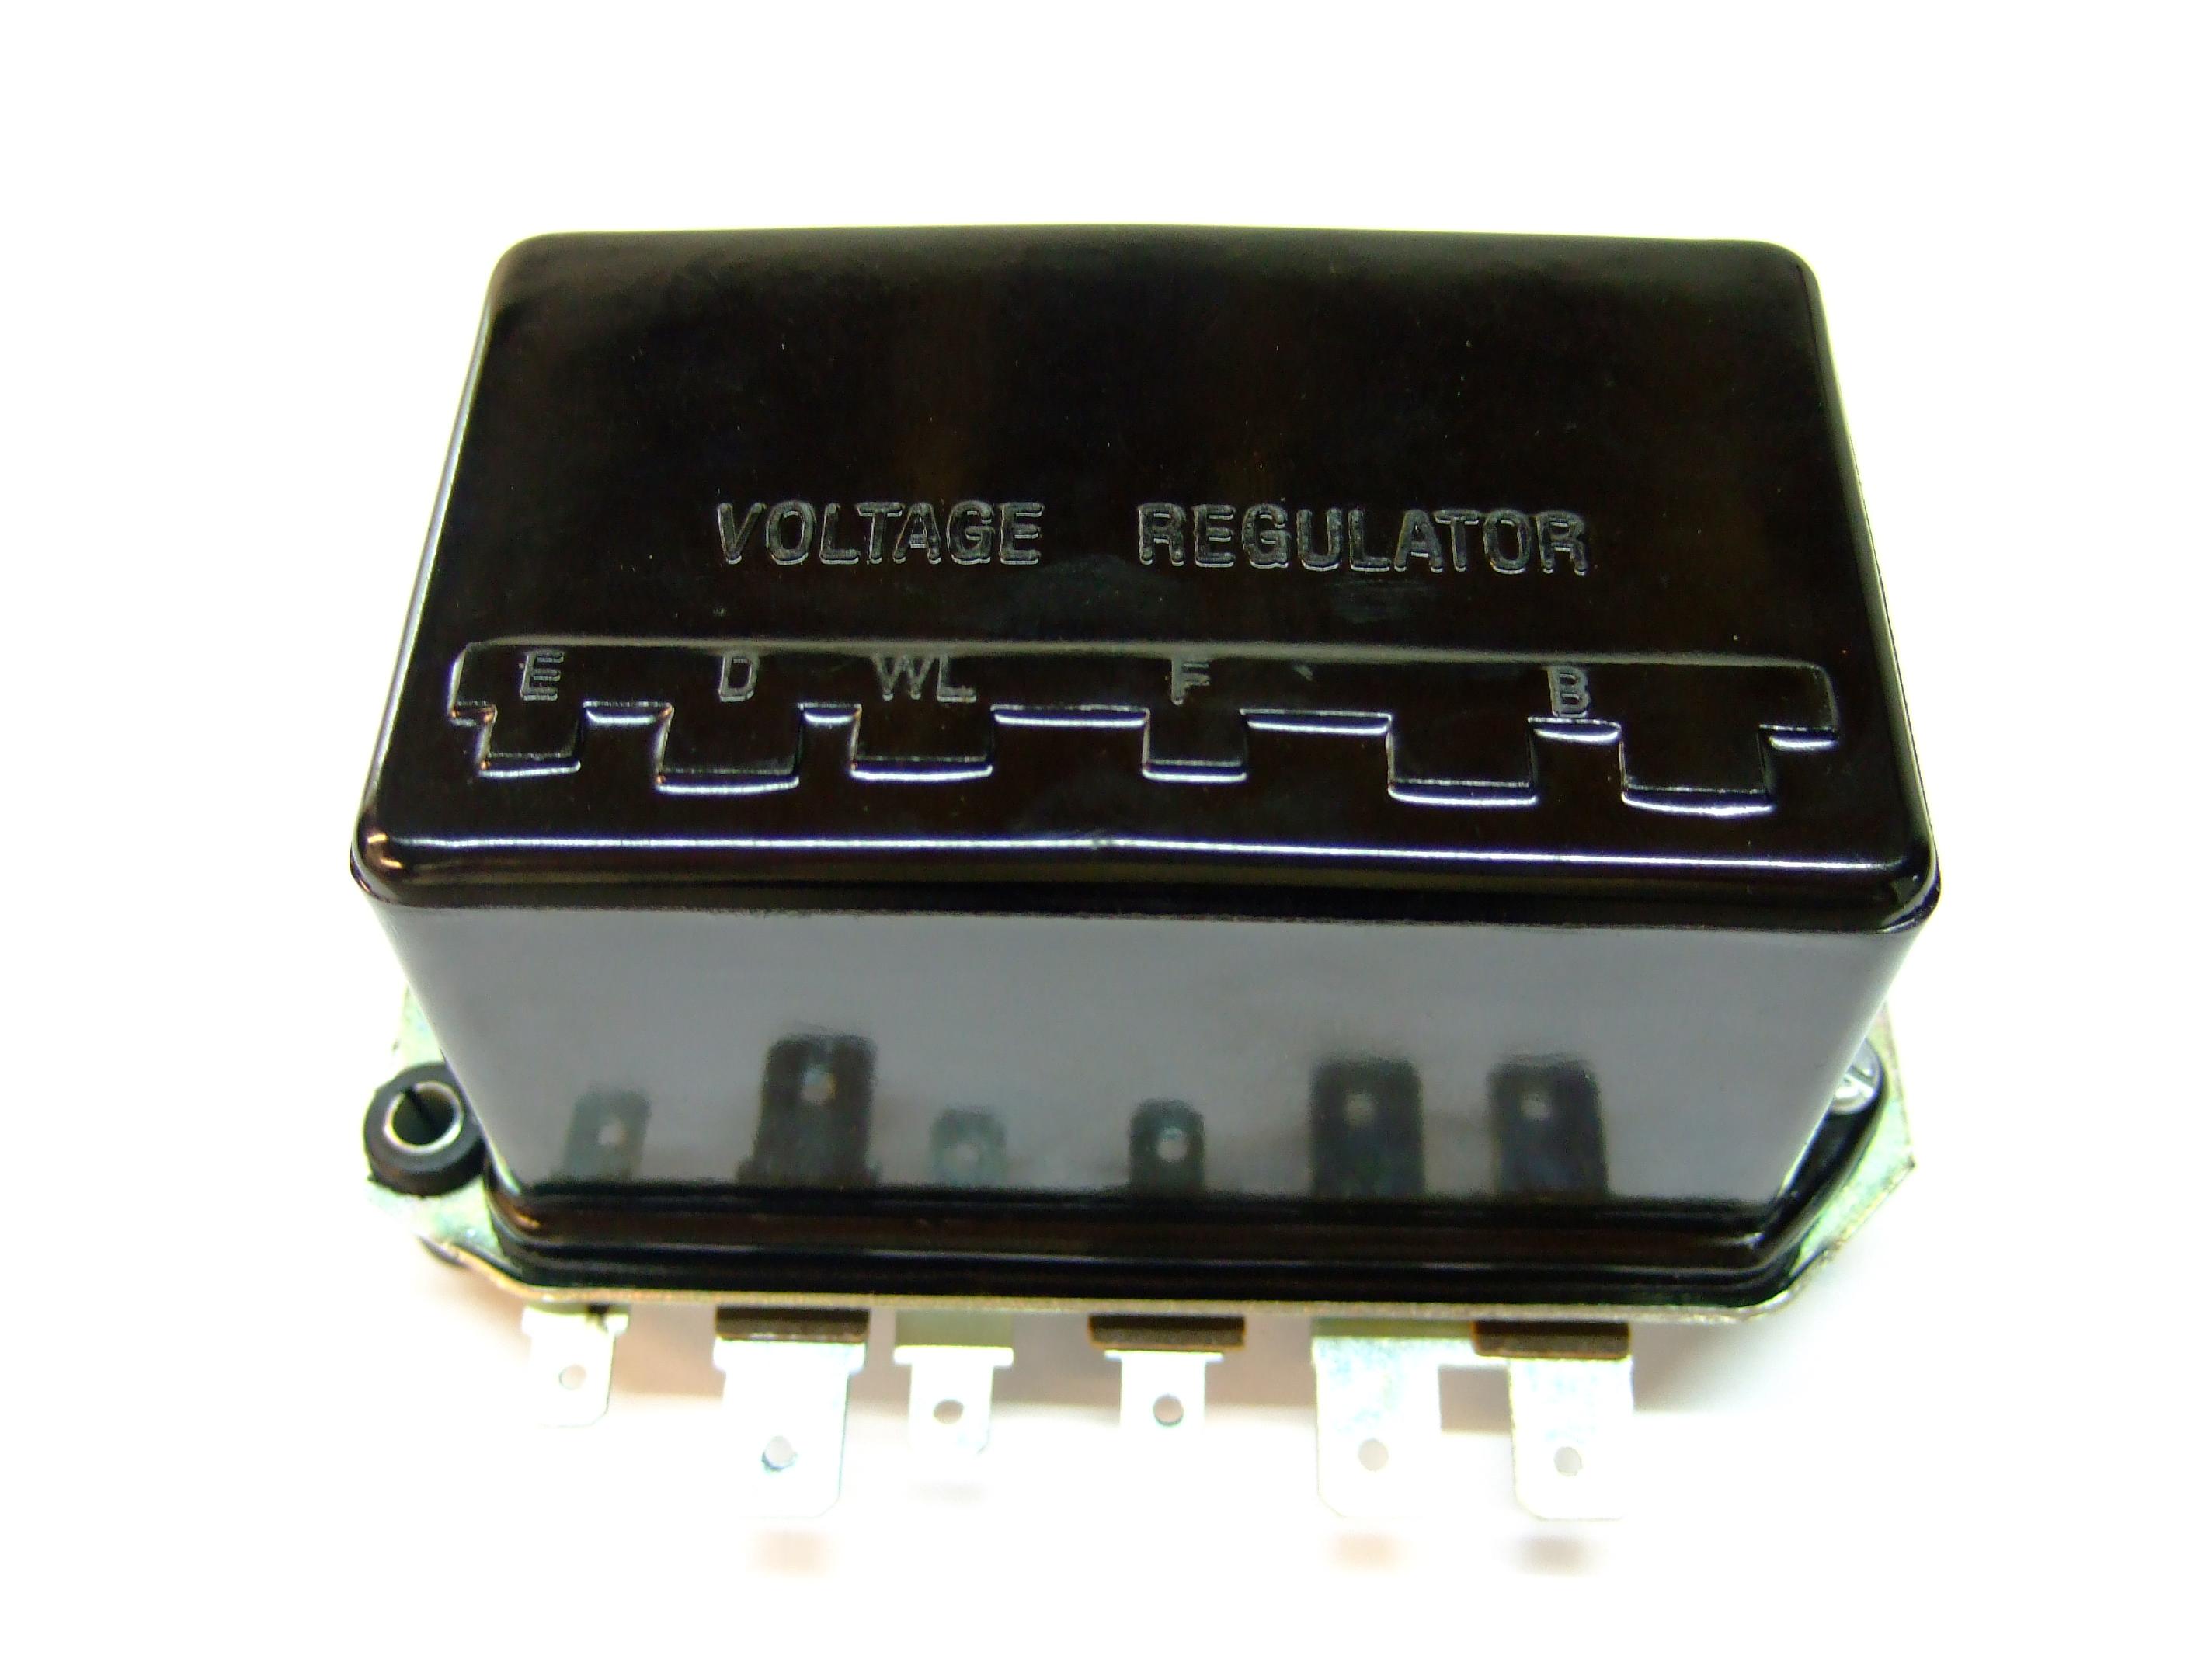 Voltage Regulator (control box)